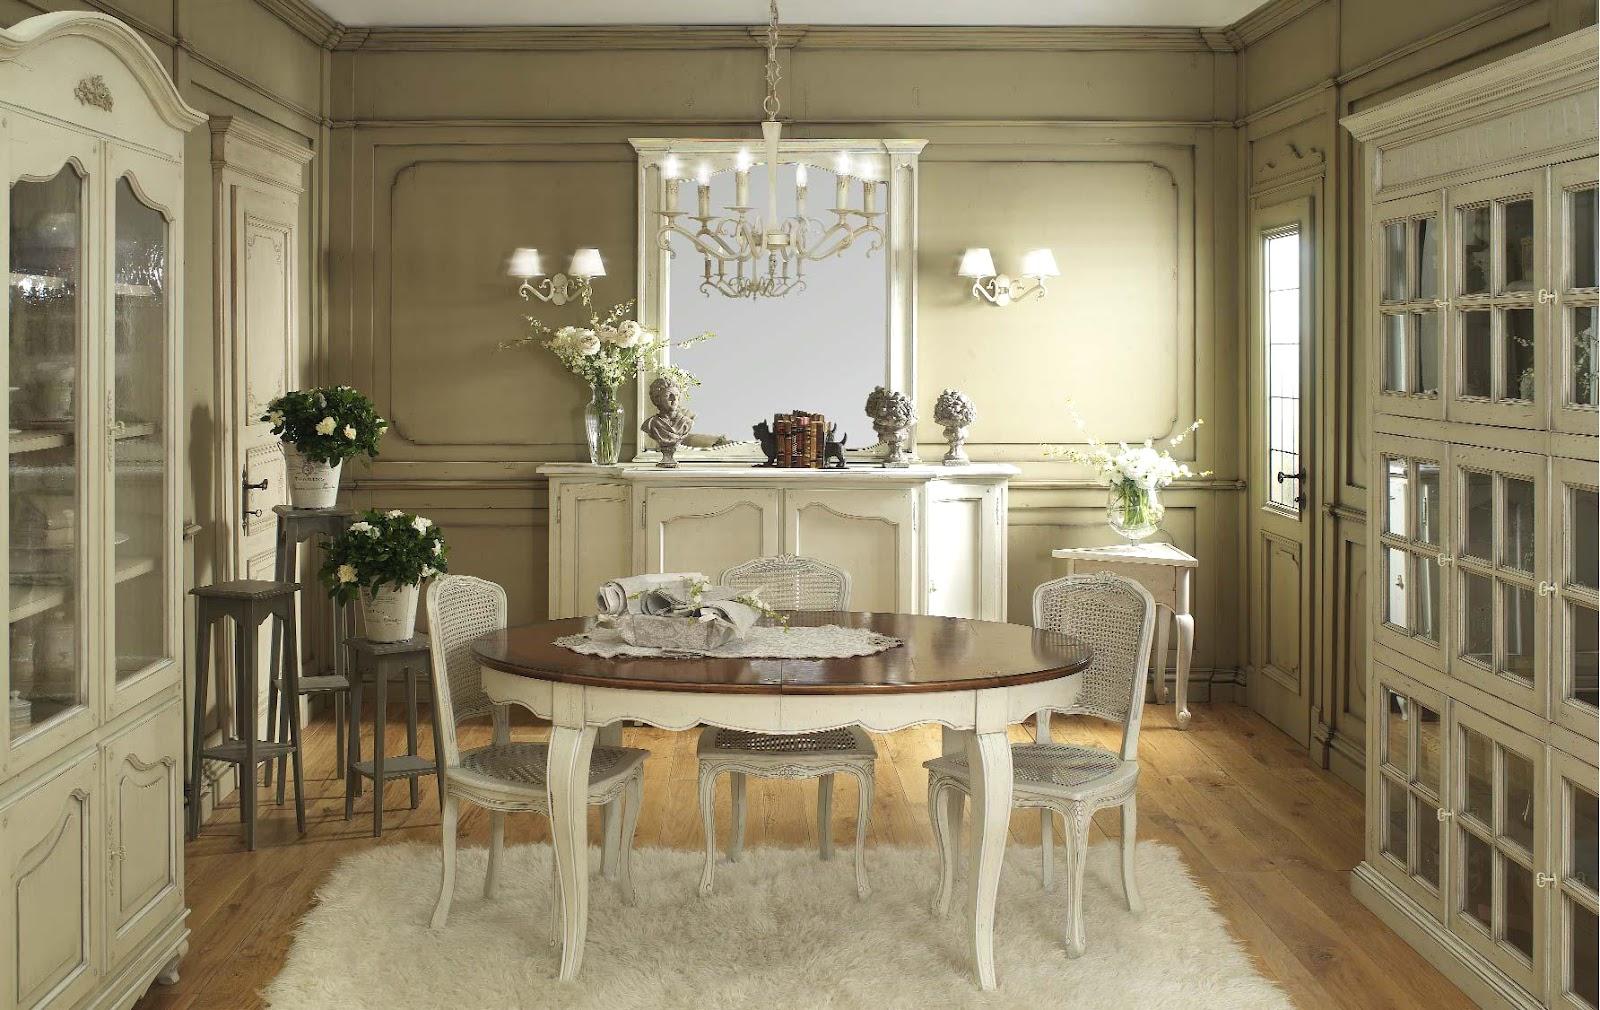 Shabby Chic and Interior Design